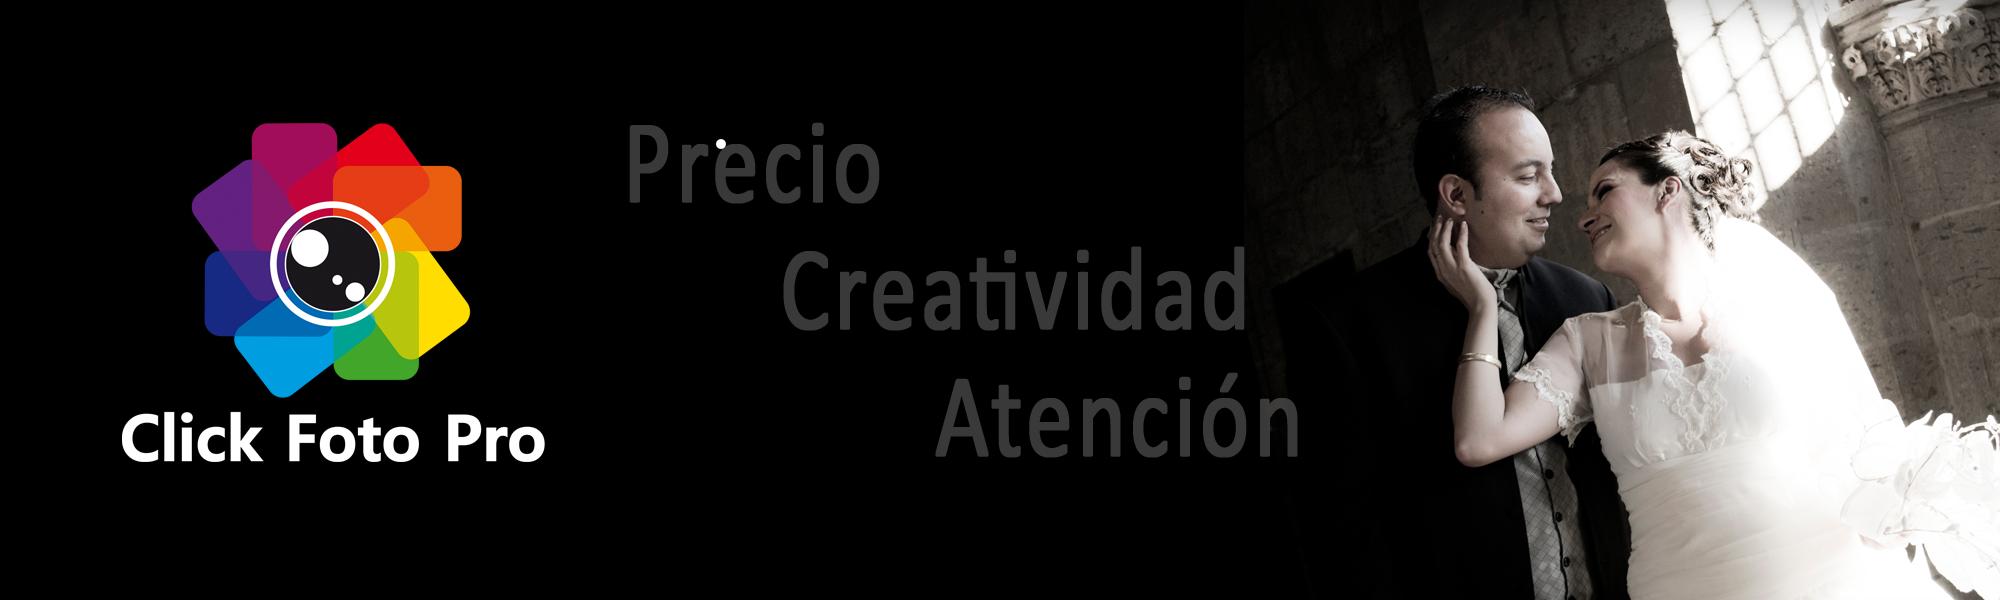 fotografo-profesional-guadalajara-jalisco-mexico